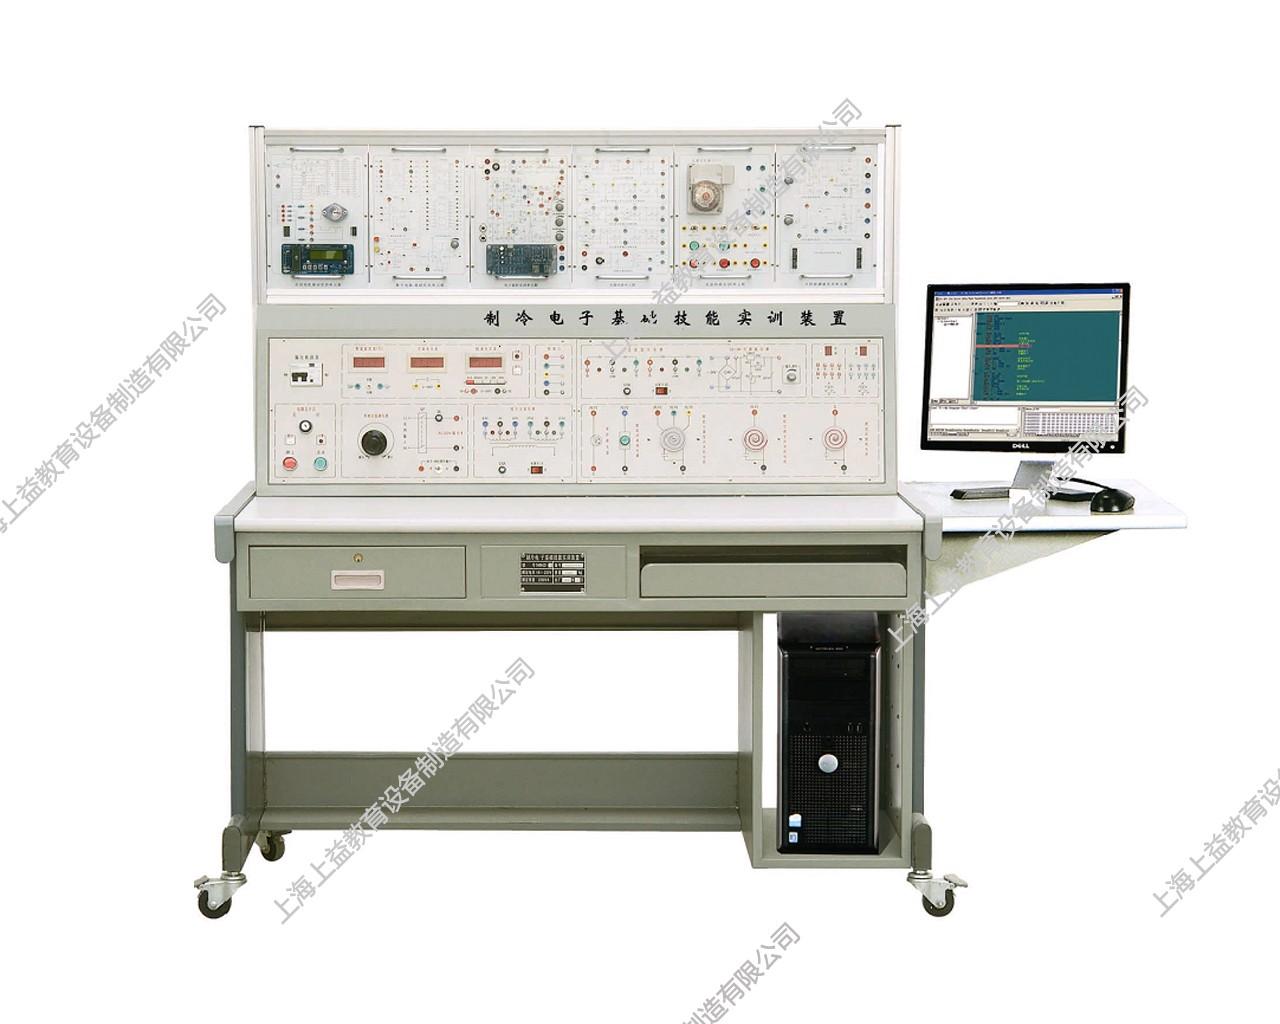 SYZLRX-03F型 制冷电子基础技能wwwlehu8vip装置